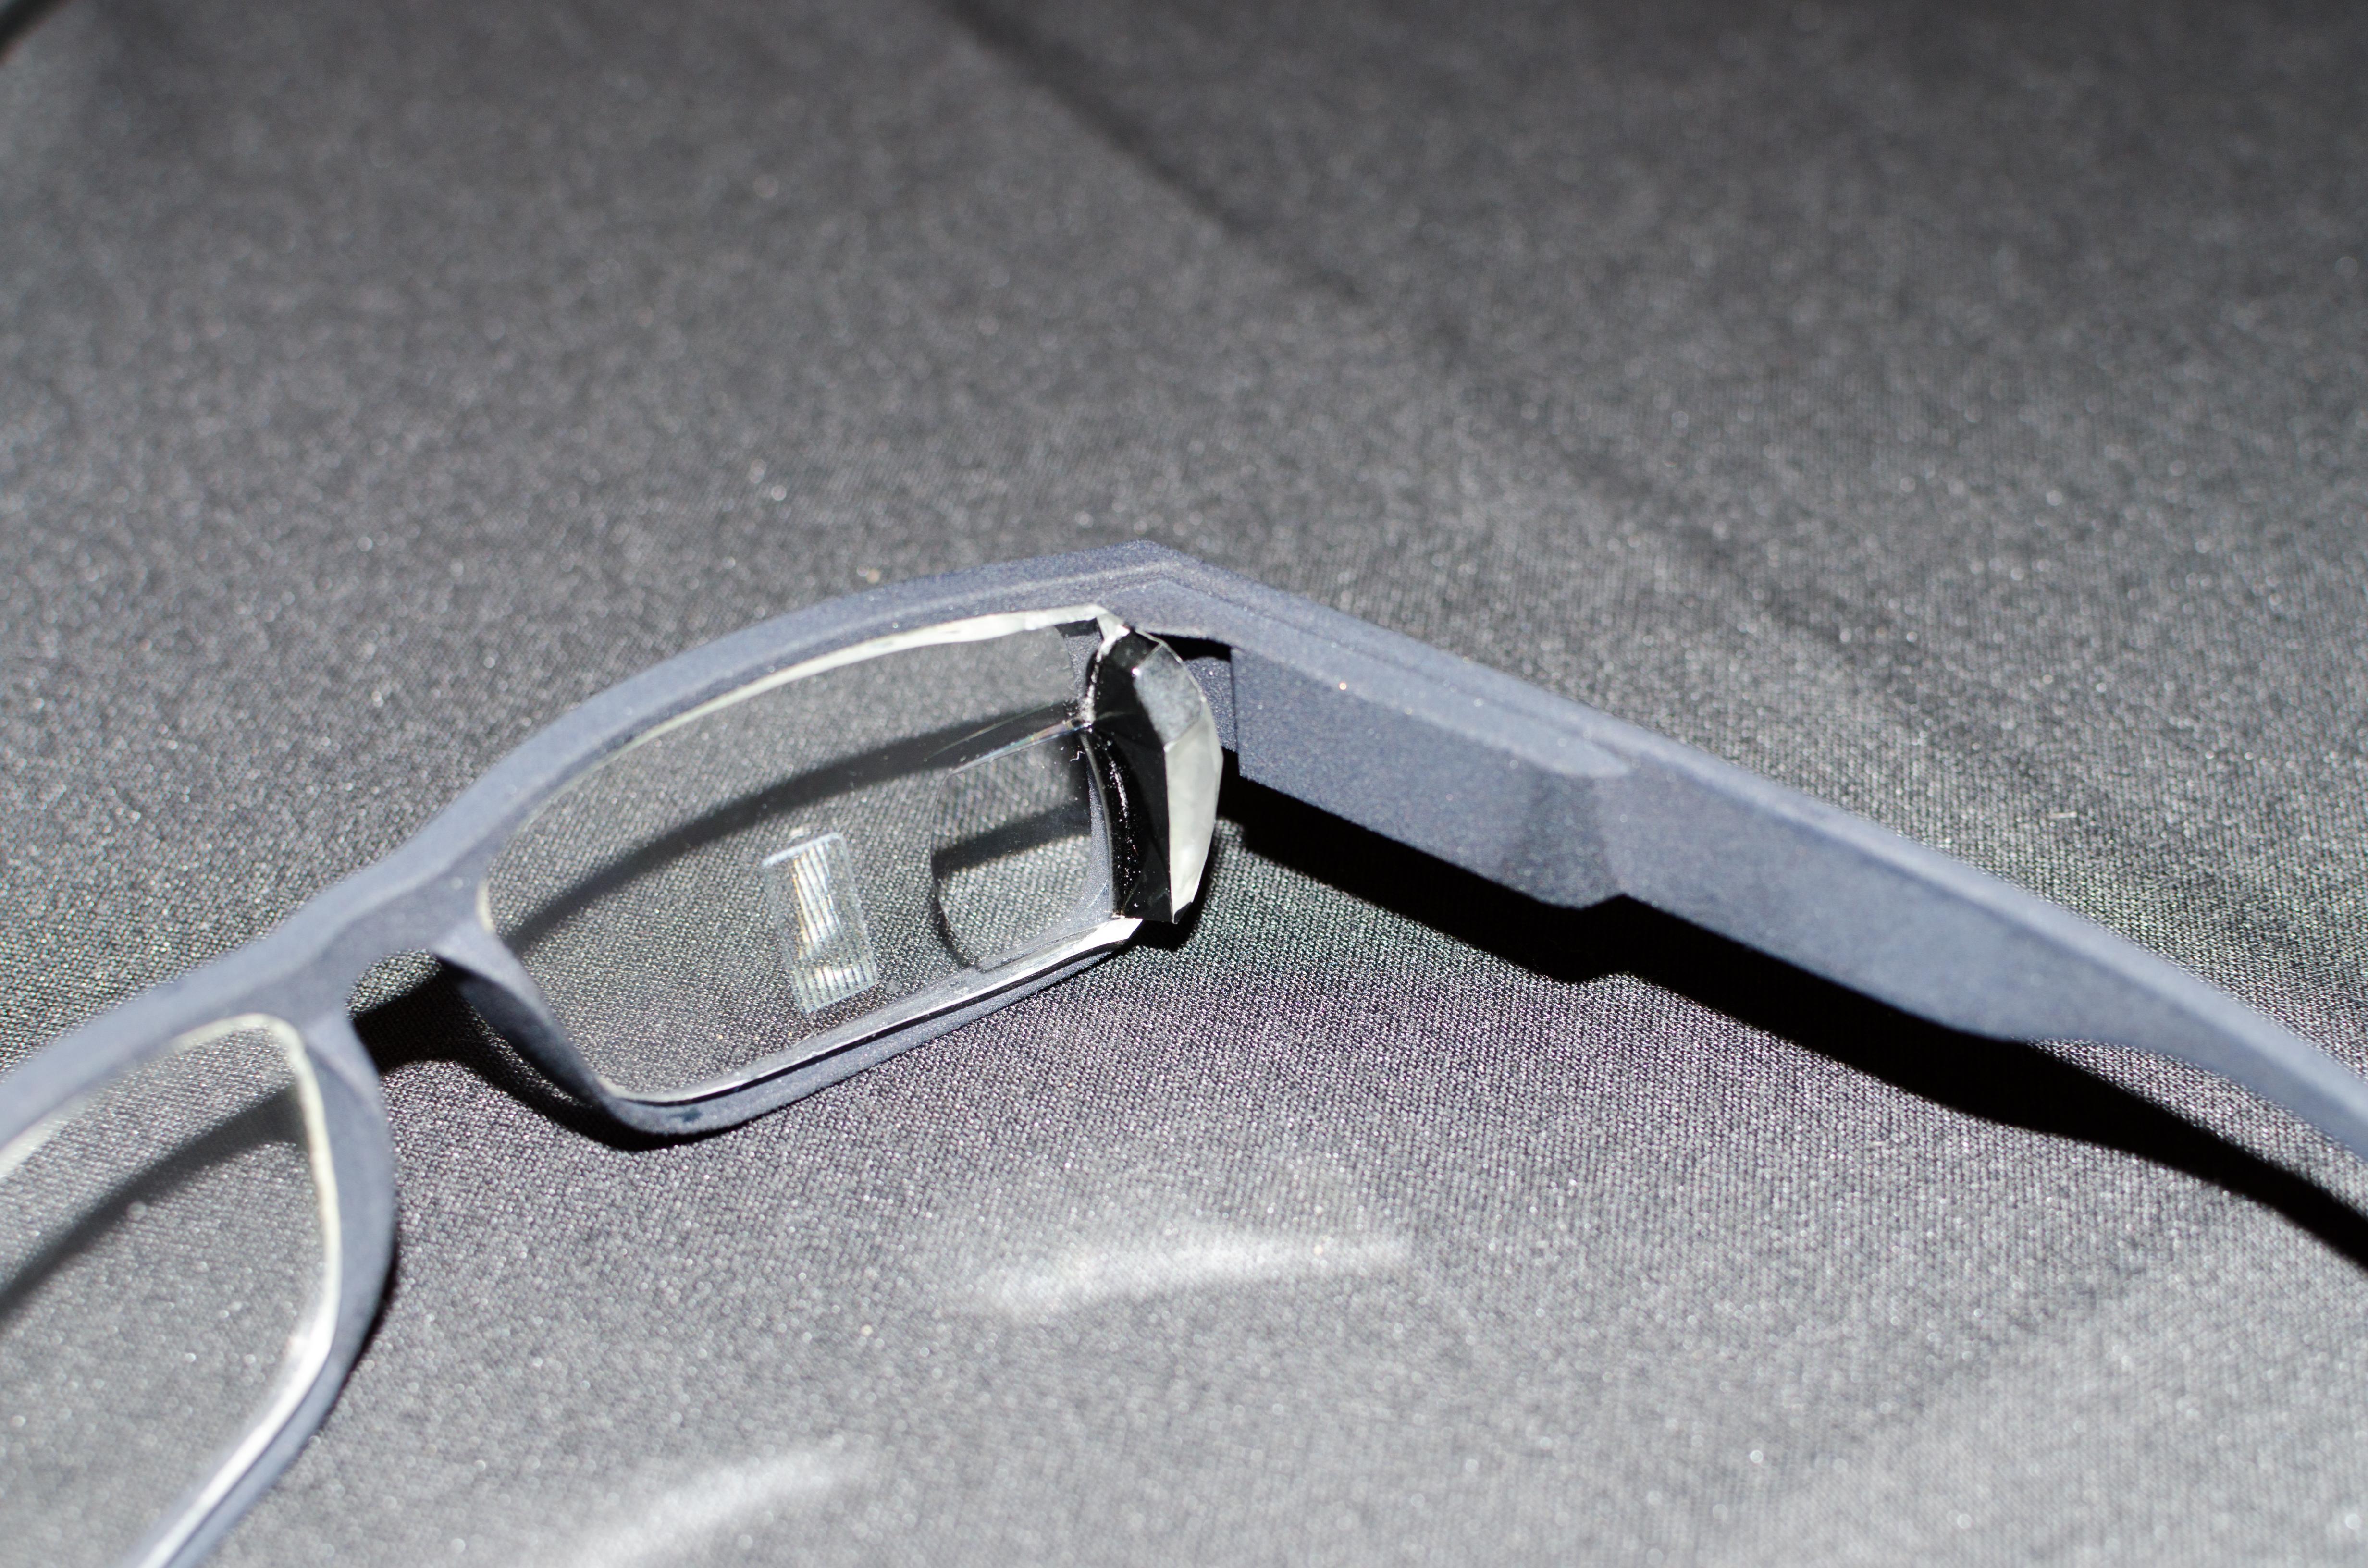 e2bf665a61 Zeiss Smart Optics  Discreet Smart Glasses